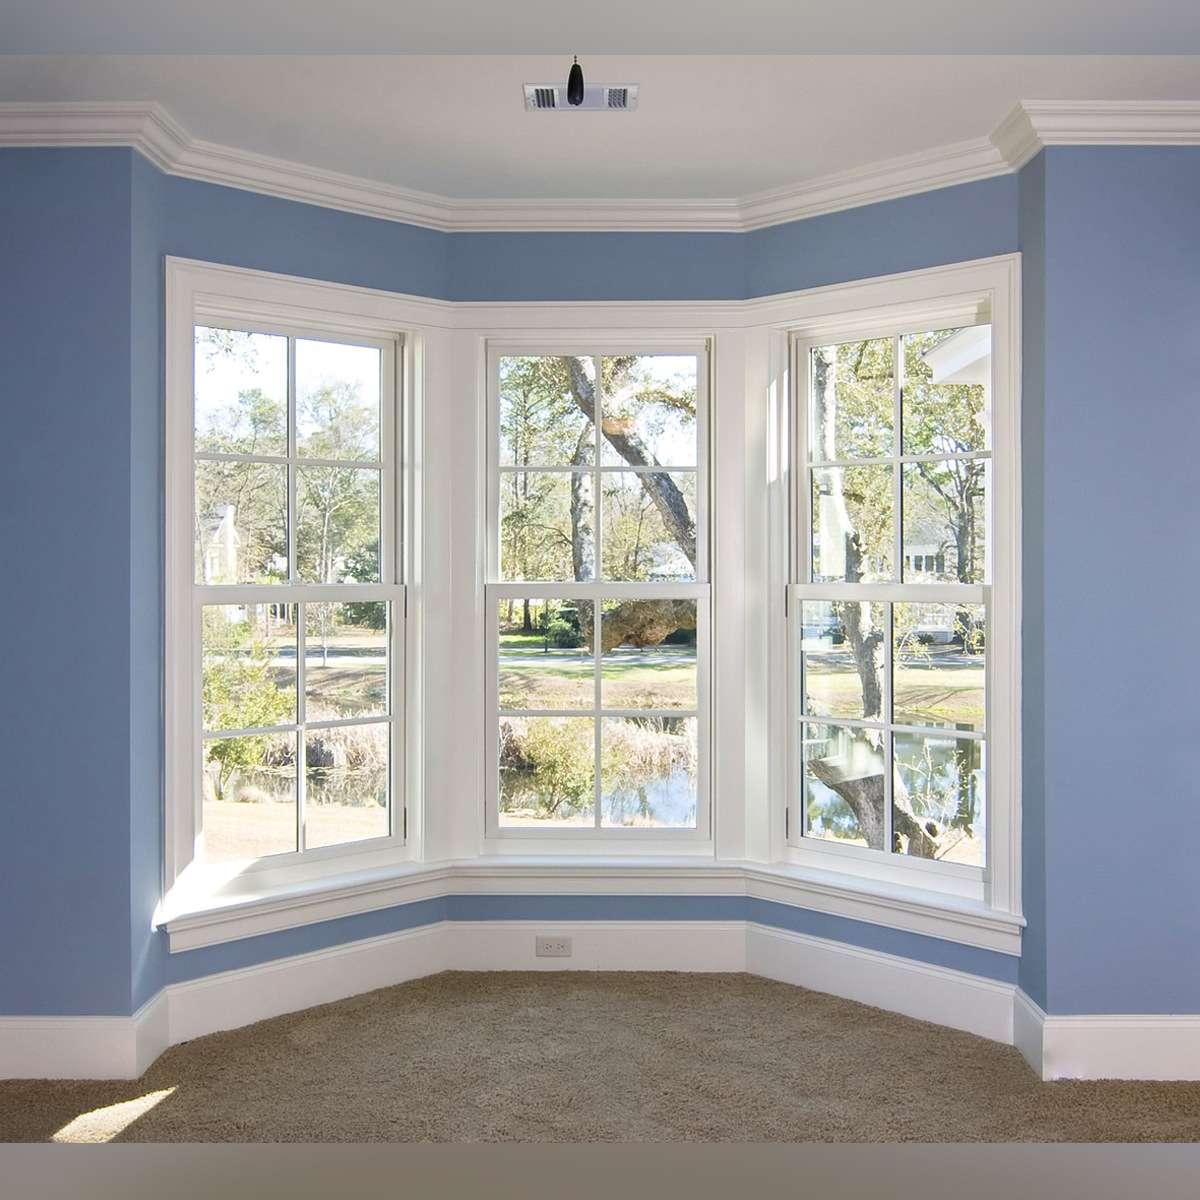 White bay window on a blue wall